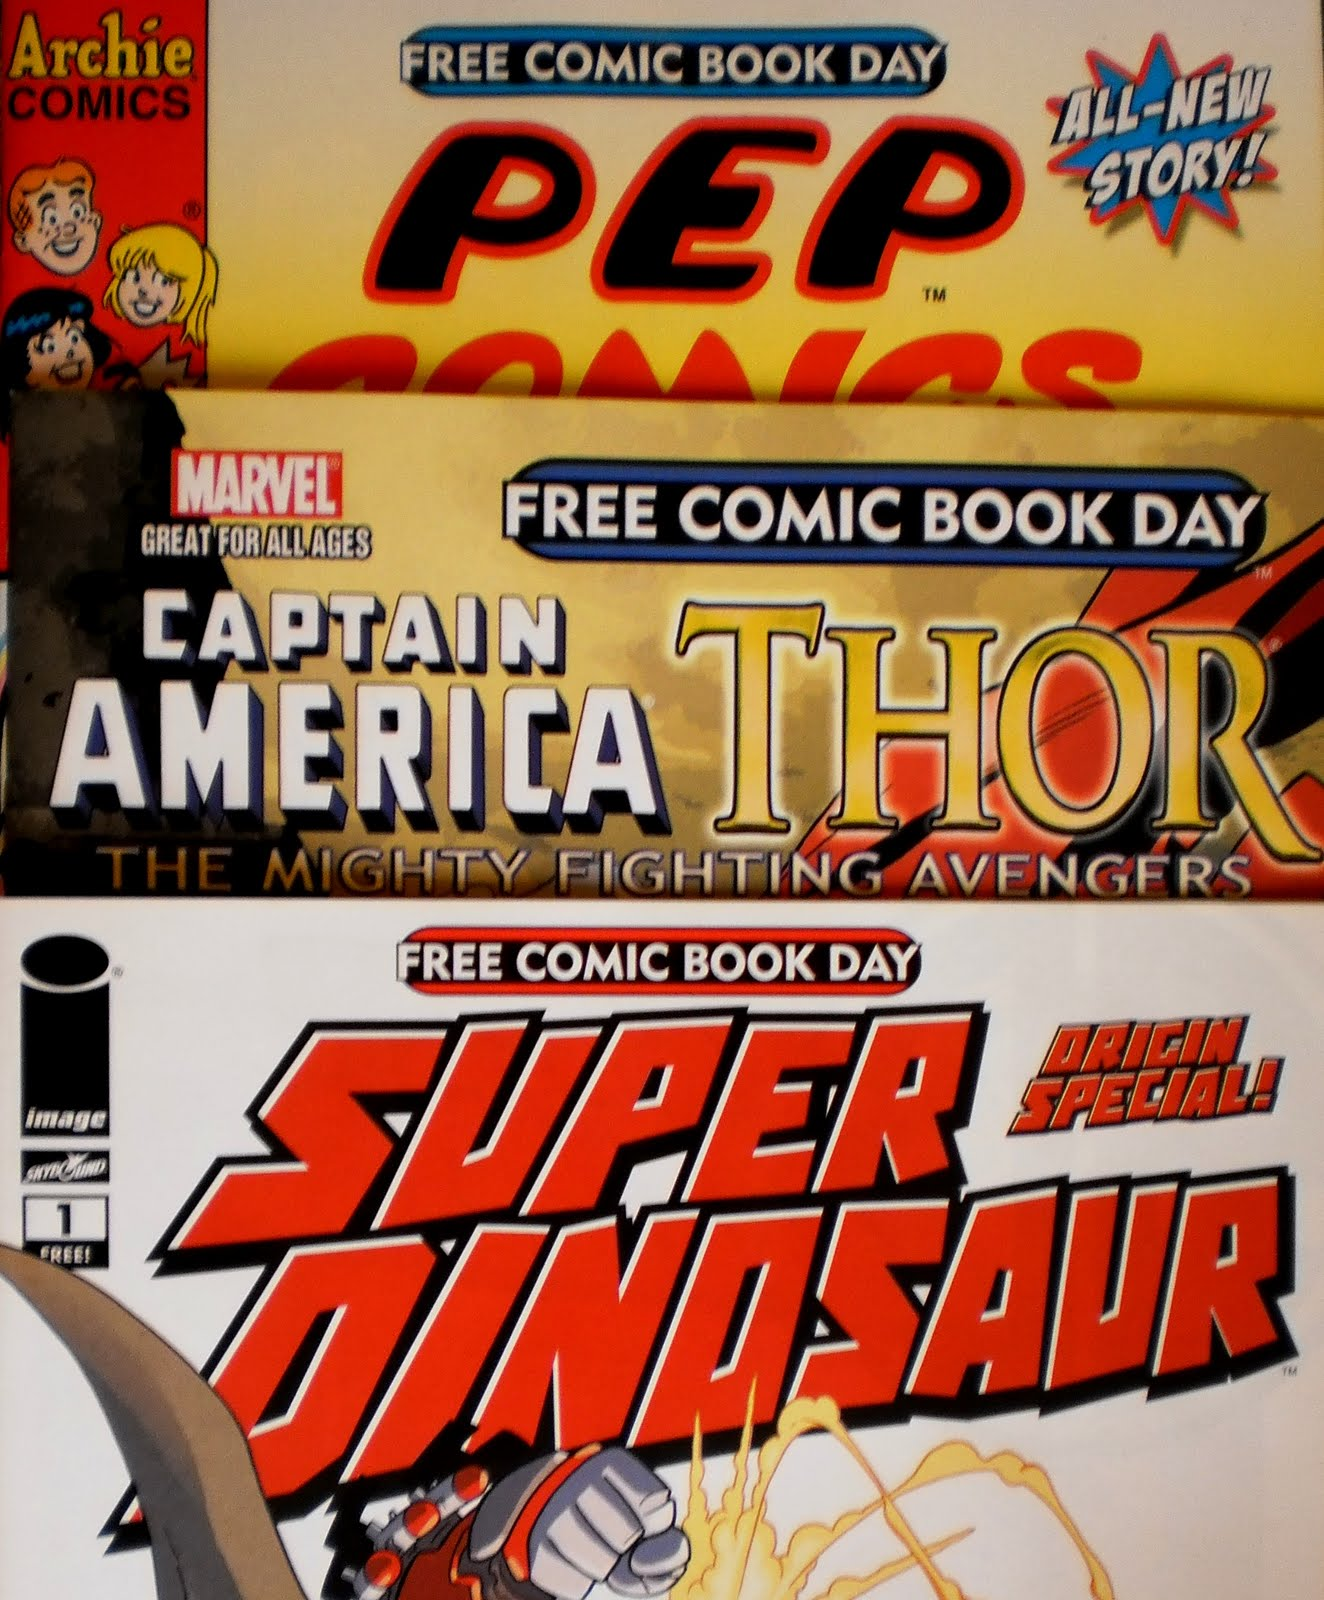 Free Comic Book Day España: COMIC APOCALIPSIS: Llegaron Los Cómics Del Free Comic Book